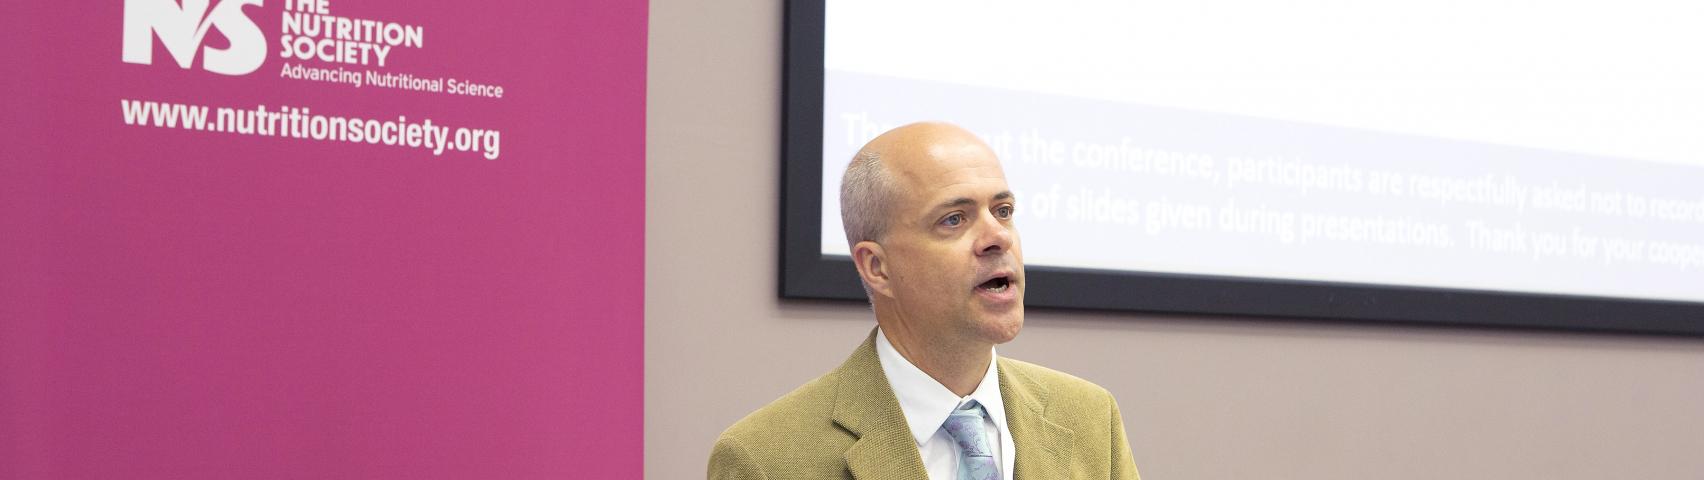 Dr Ruan Elliott presenting at the Summer Conference 2018